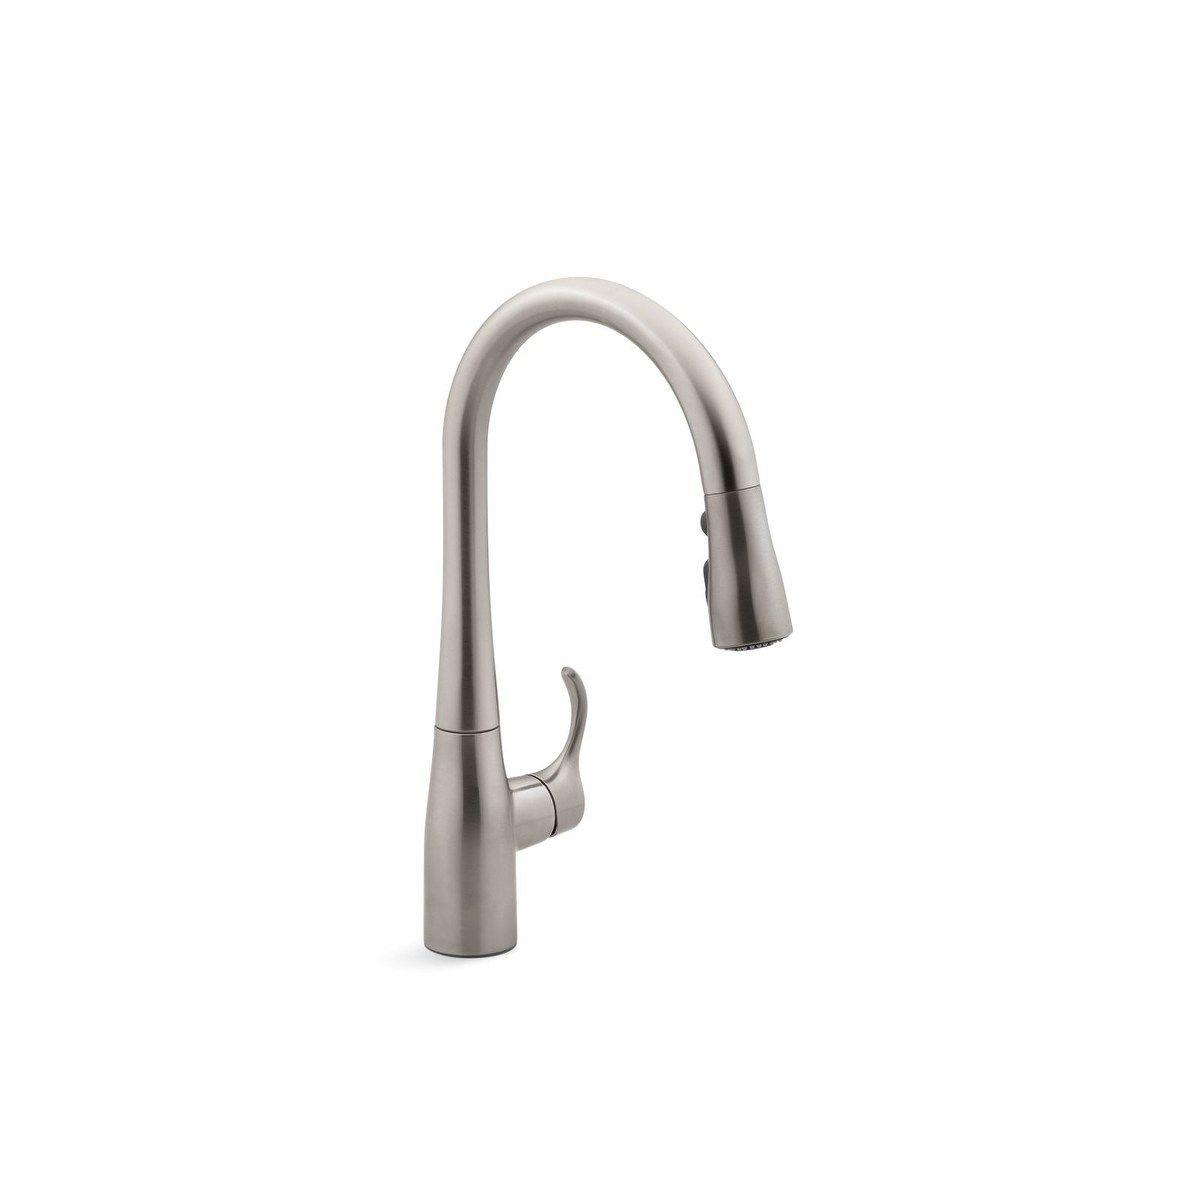 Kohler Simplice Pullout Spray Single Hole Kitchen Faucet K 597 Vs